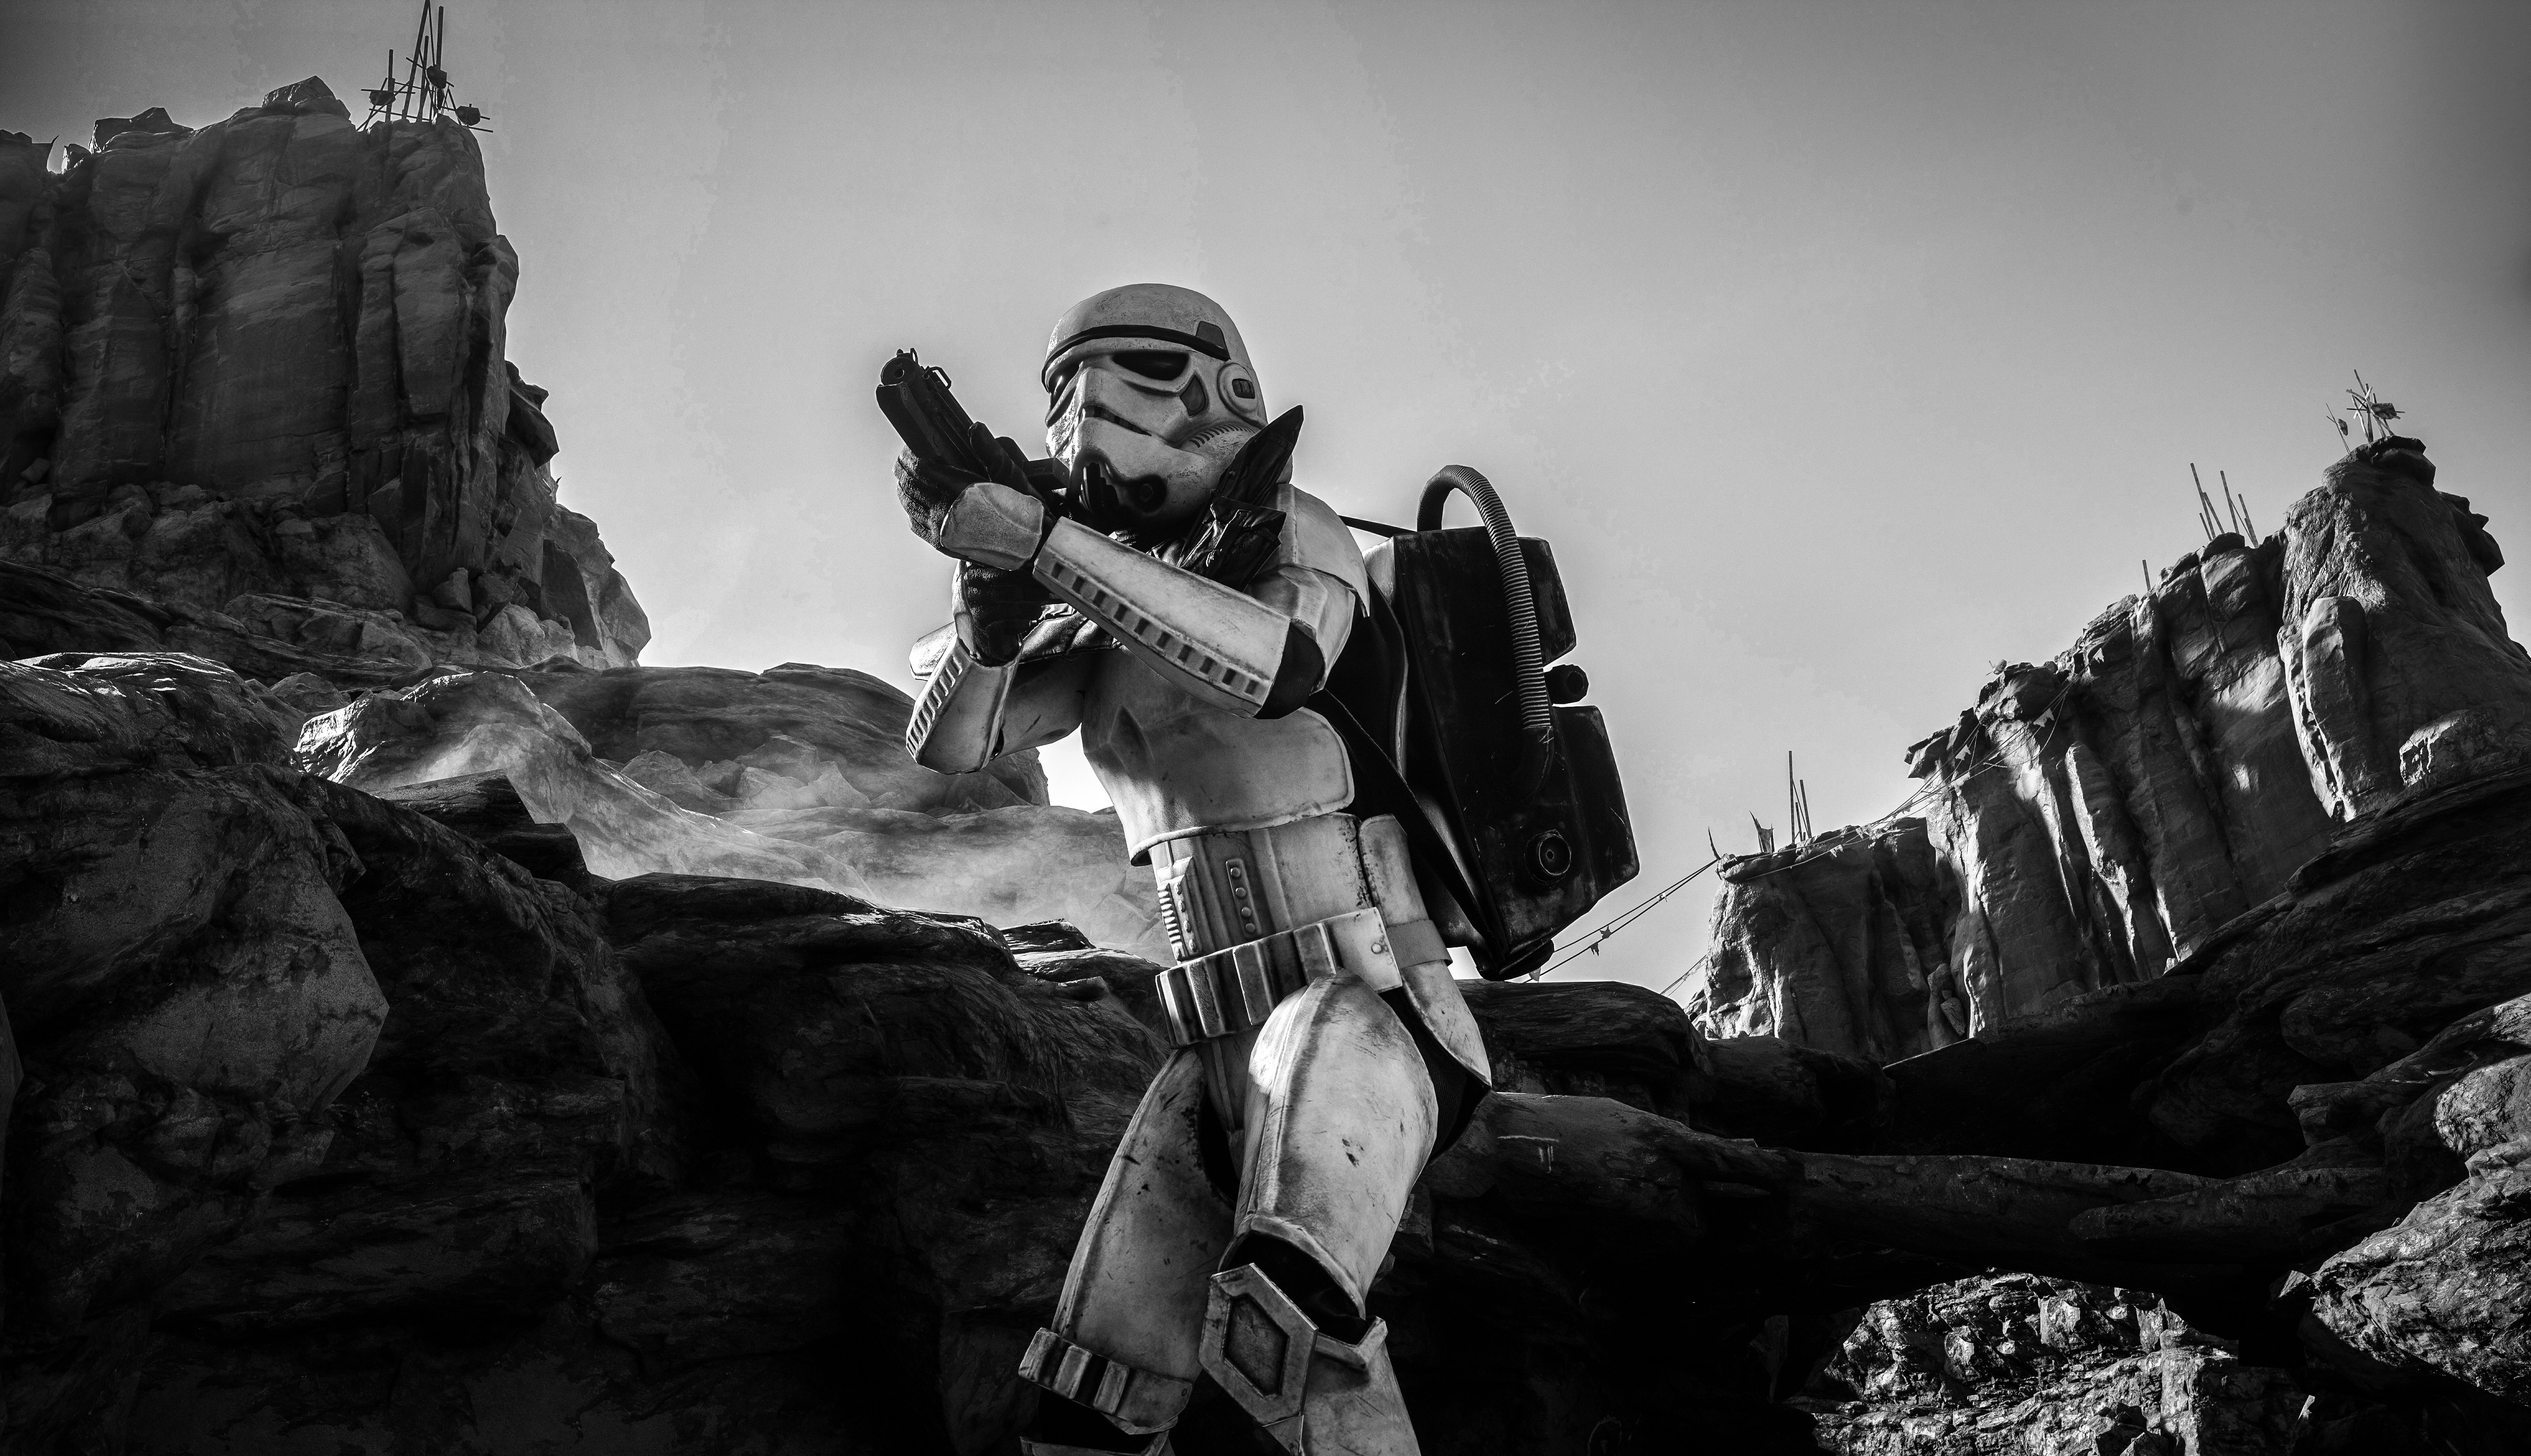 Storm Trooper Background 4k 5005x2880 Wallpaper Teahub Io